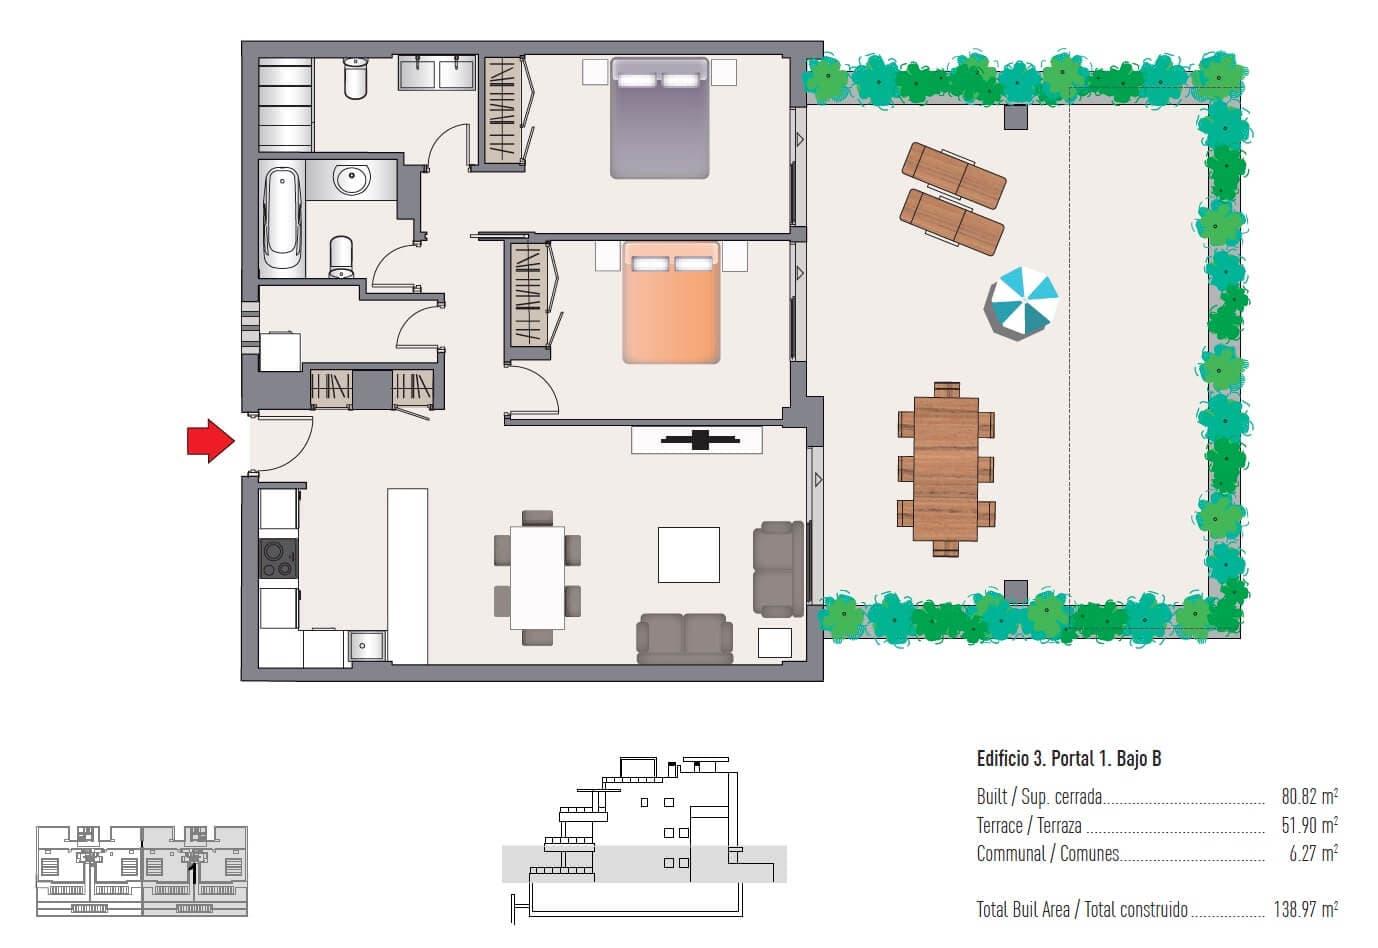 las olas estepona appartement te koop grondplan 2 slaapkamers